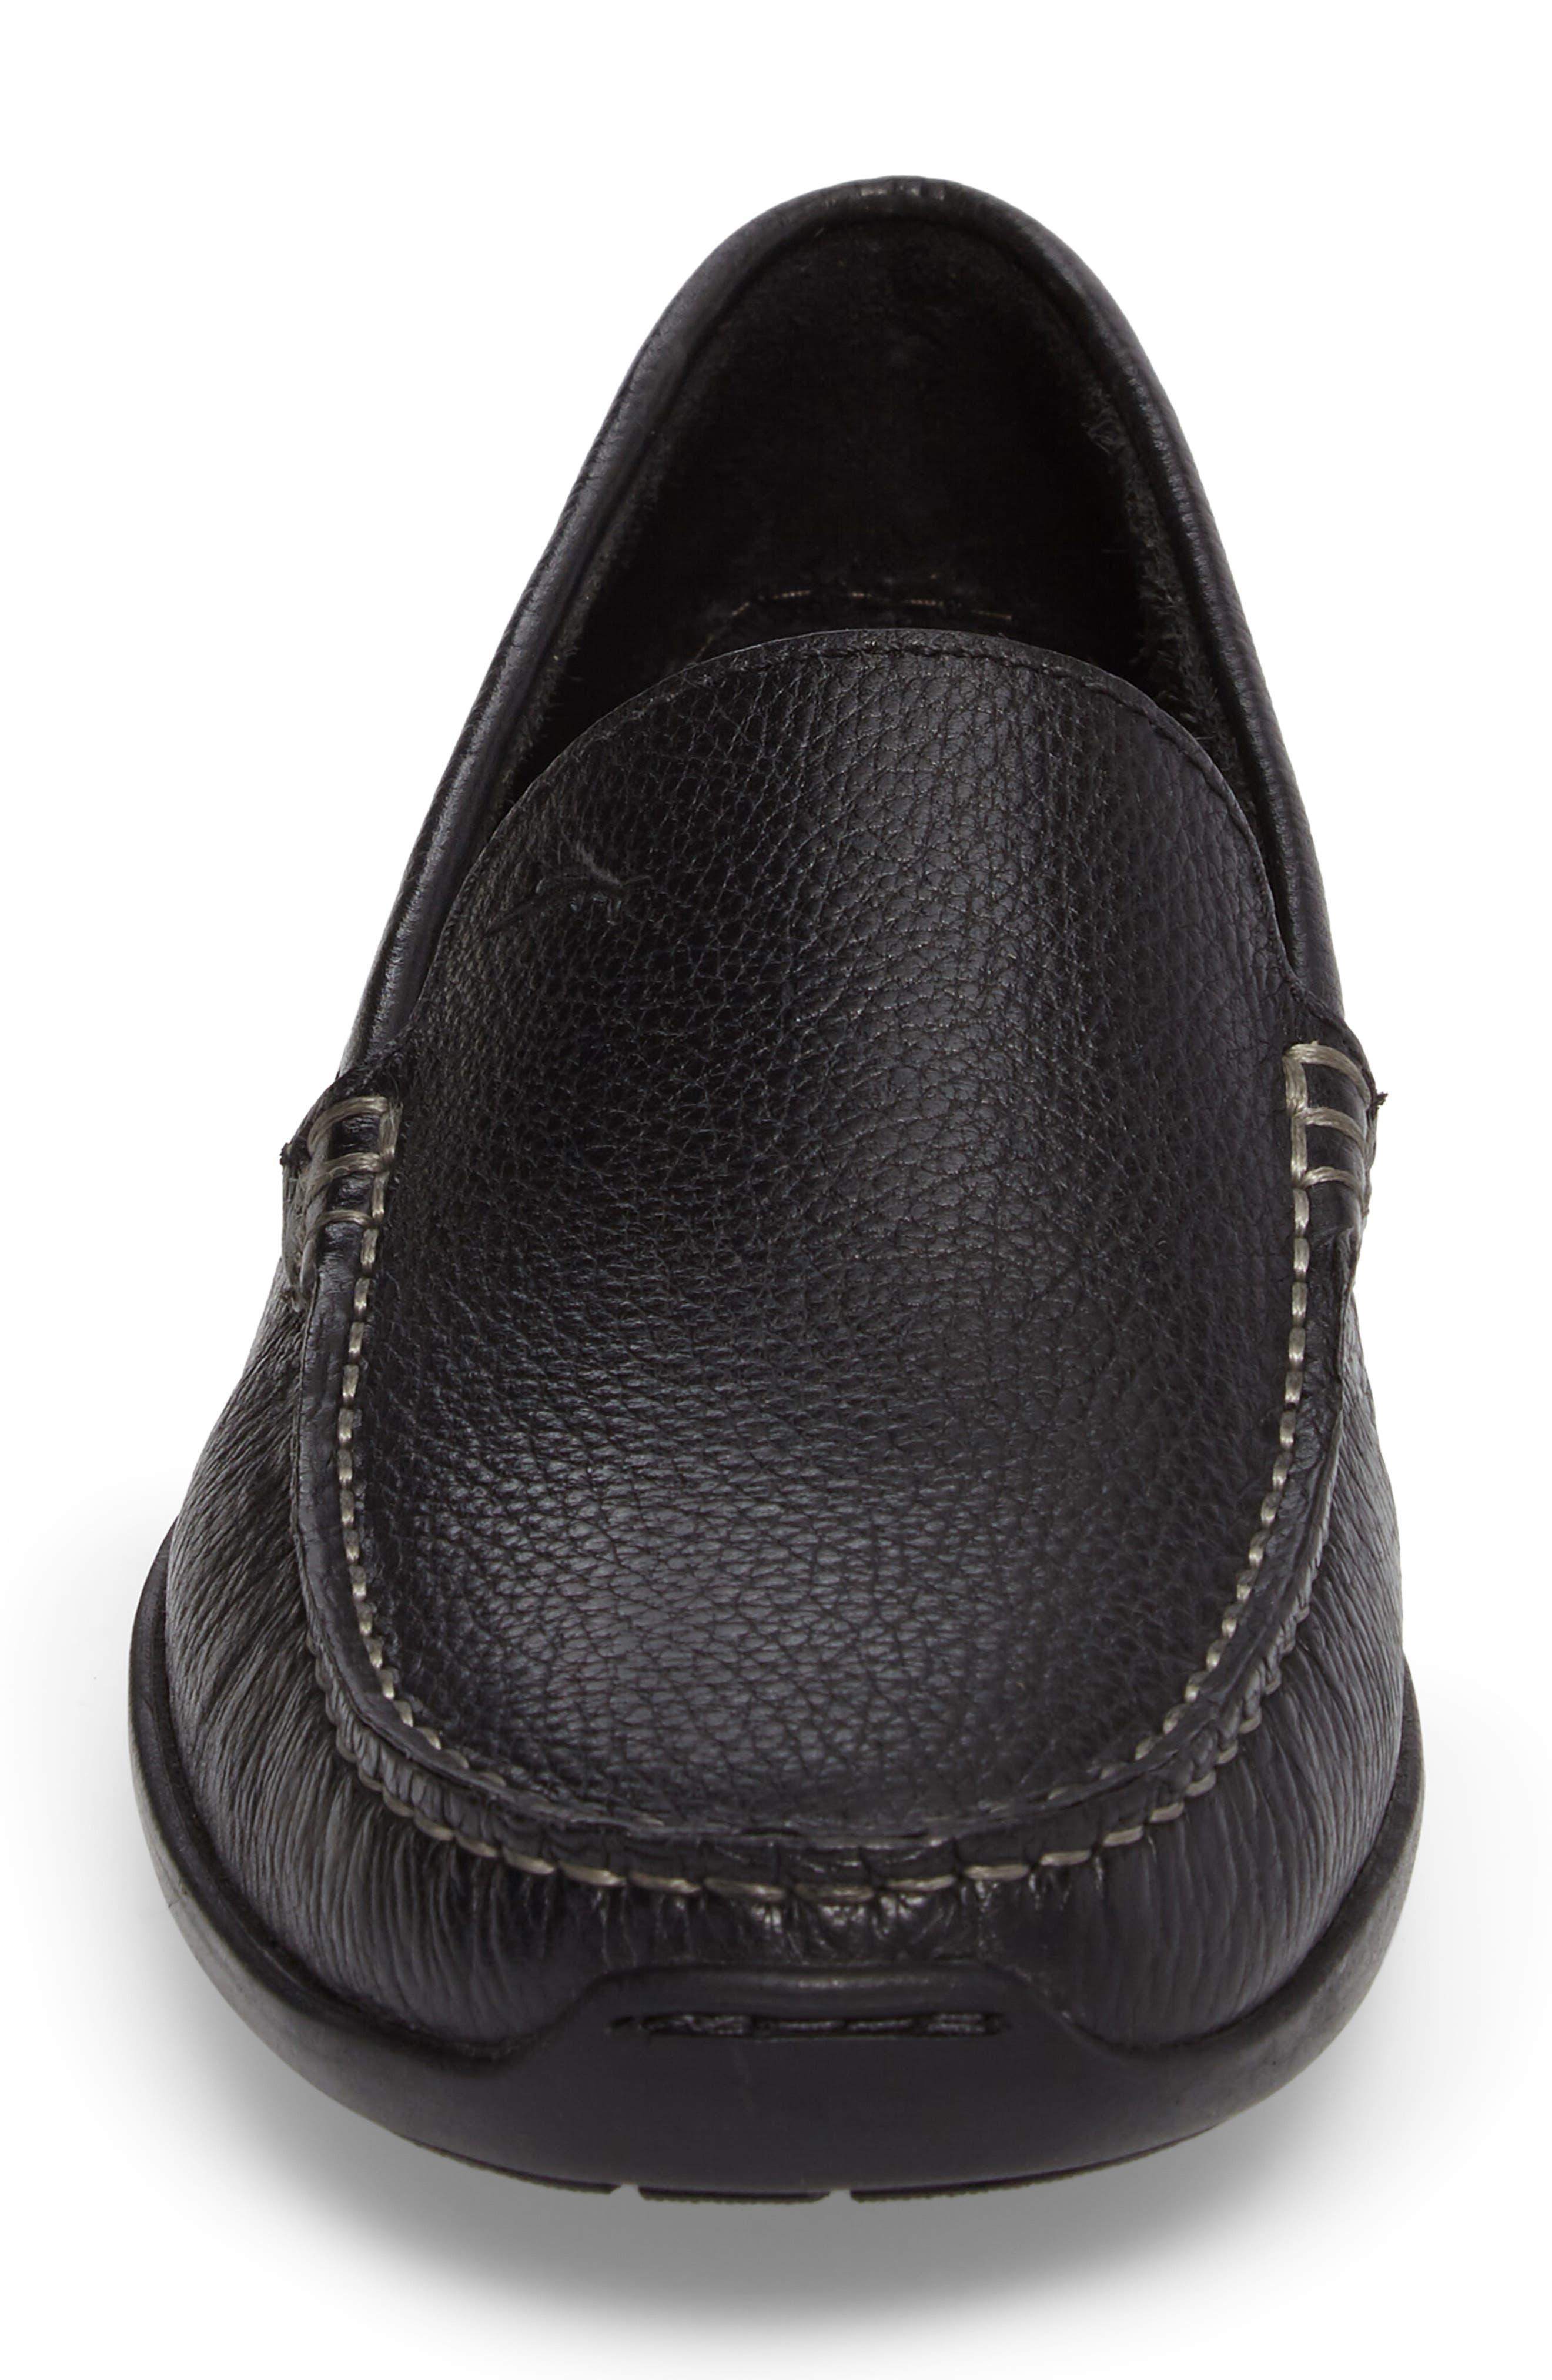 Orion Venetian Loafer,                             Alternate thumbnail 4, color,                             BLACK LEATHER